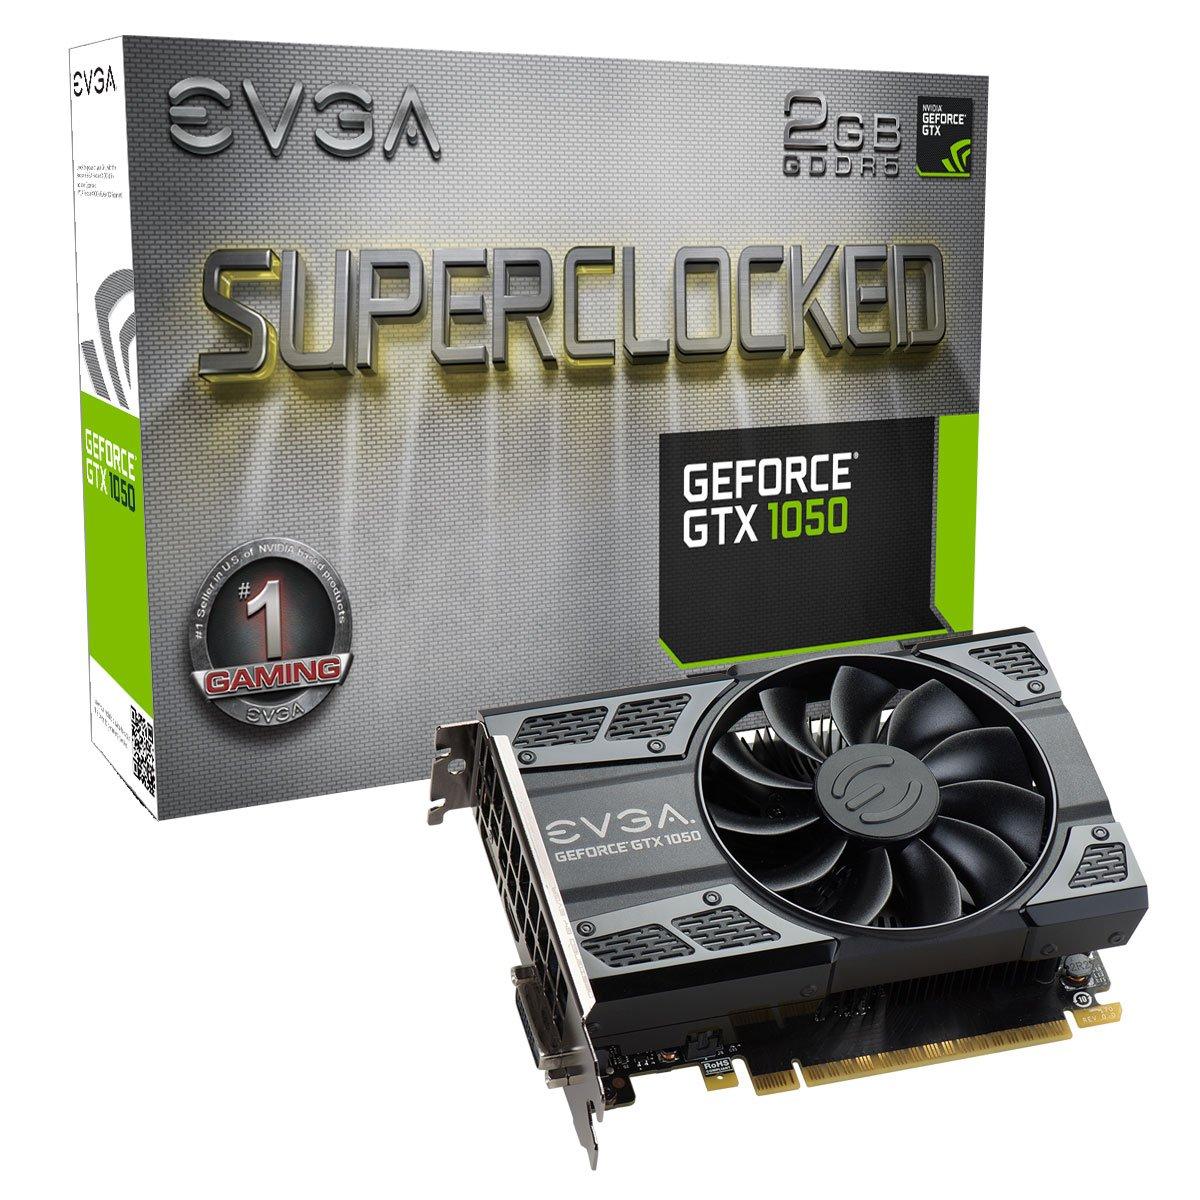 EVGA GeForce GTX 1050 SC Gaming, 2GB GDDR5 Graphics Card